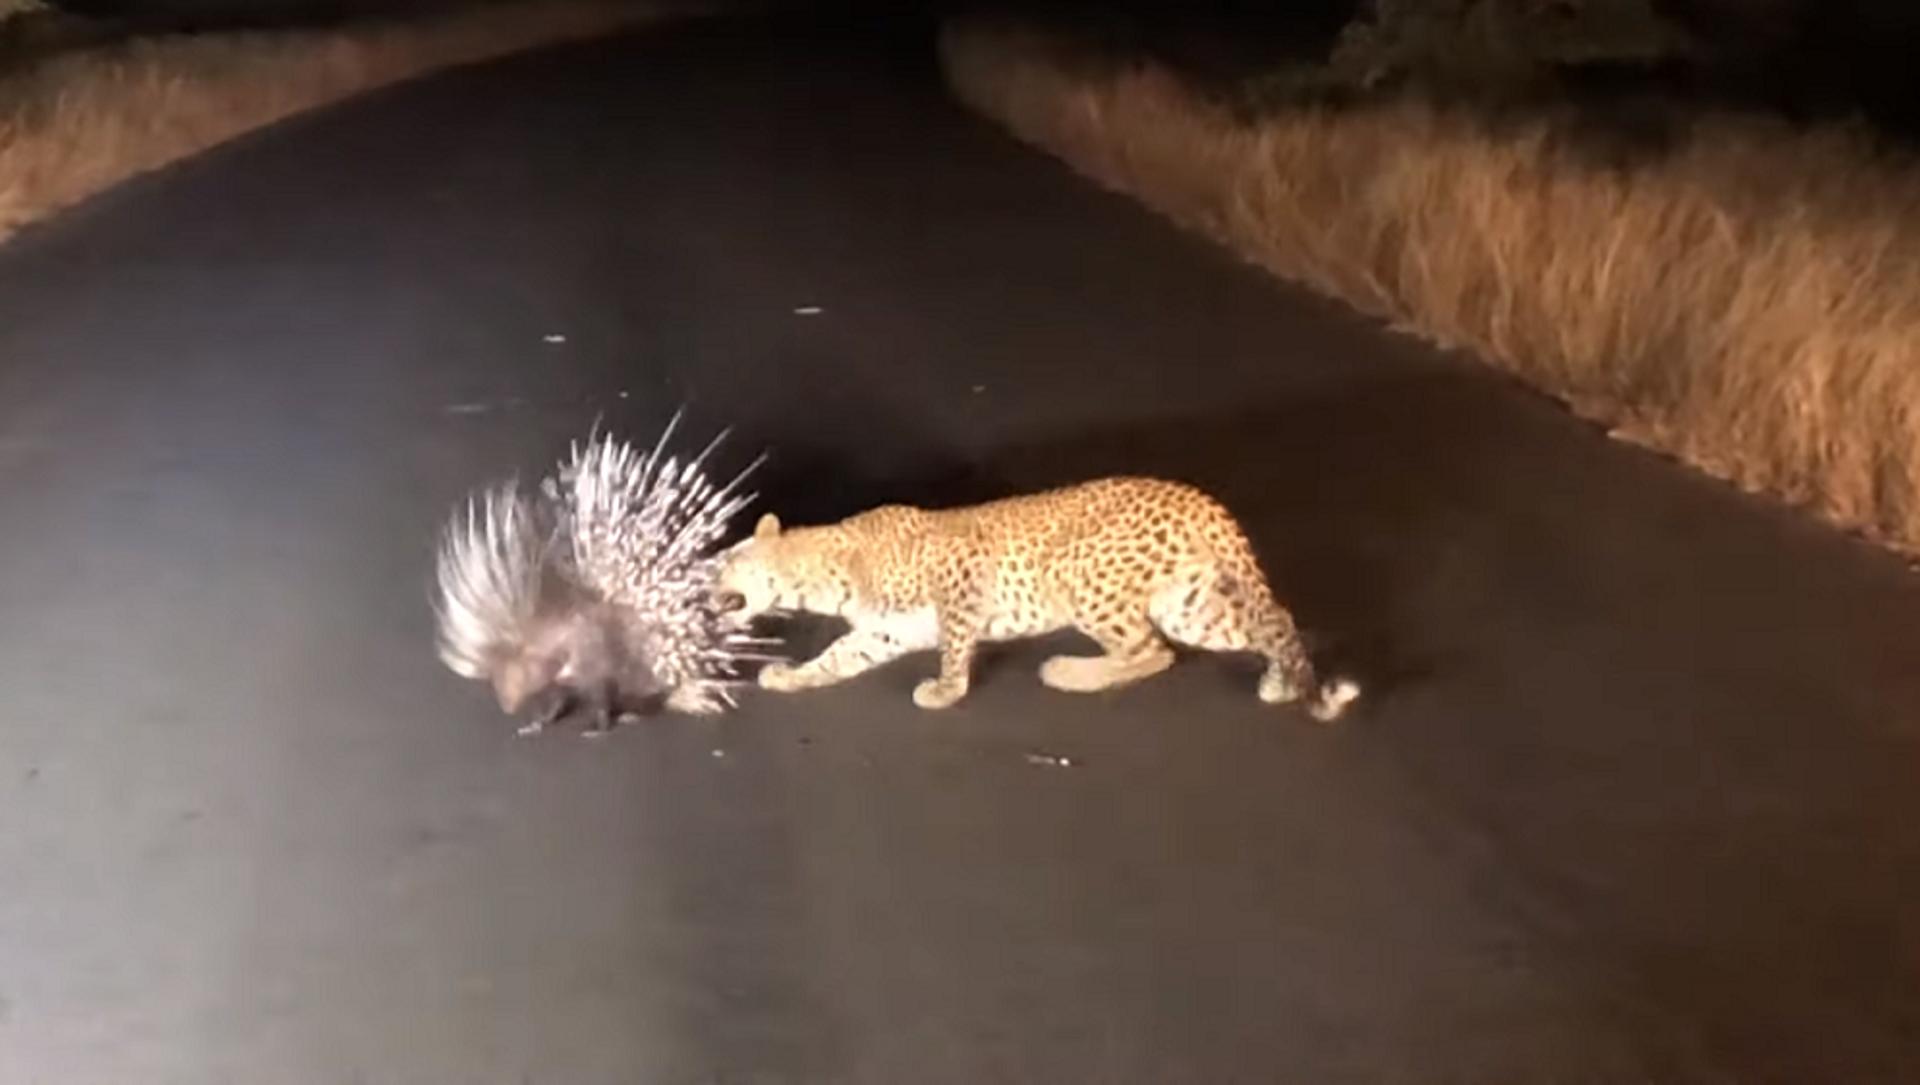 Нападение голодного леопарда на дикобраза сняли на видео - Sputnik Грузия, 1920, 28.07.2021